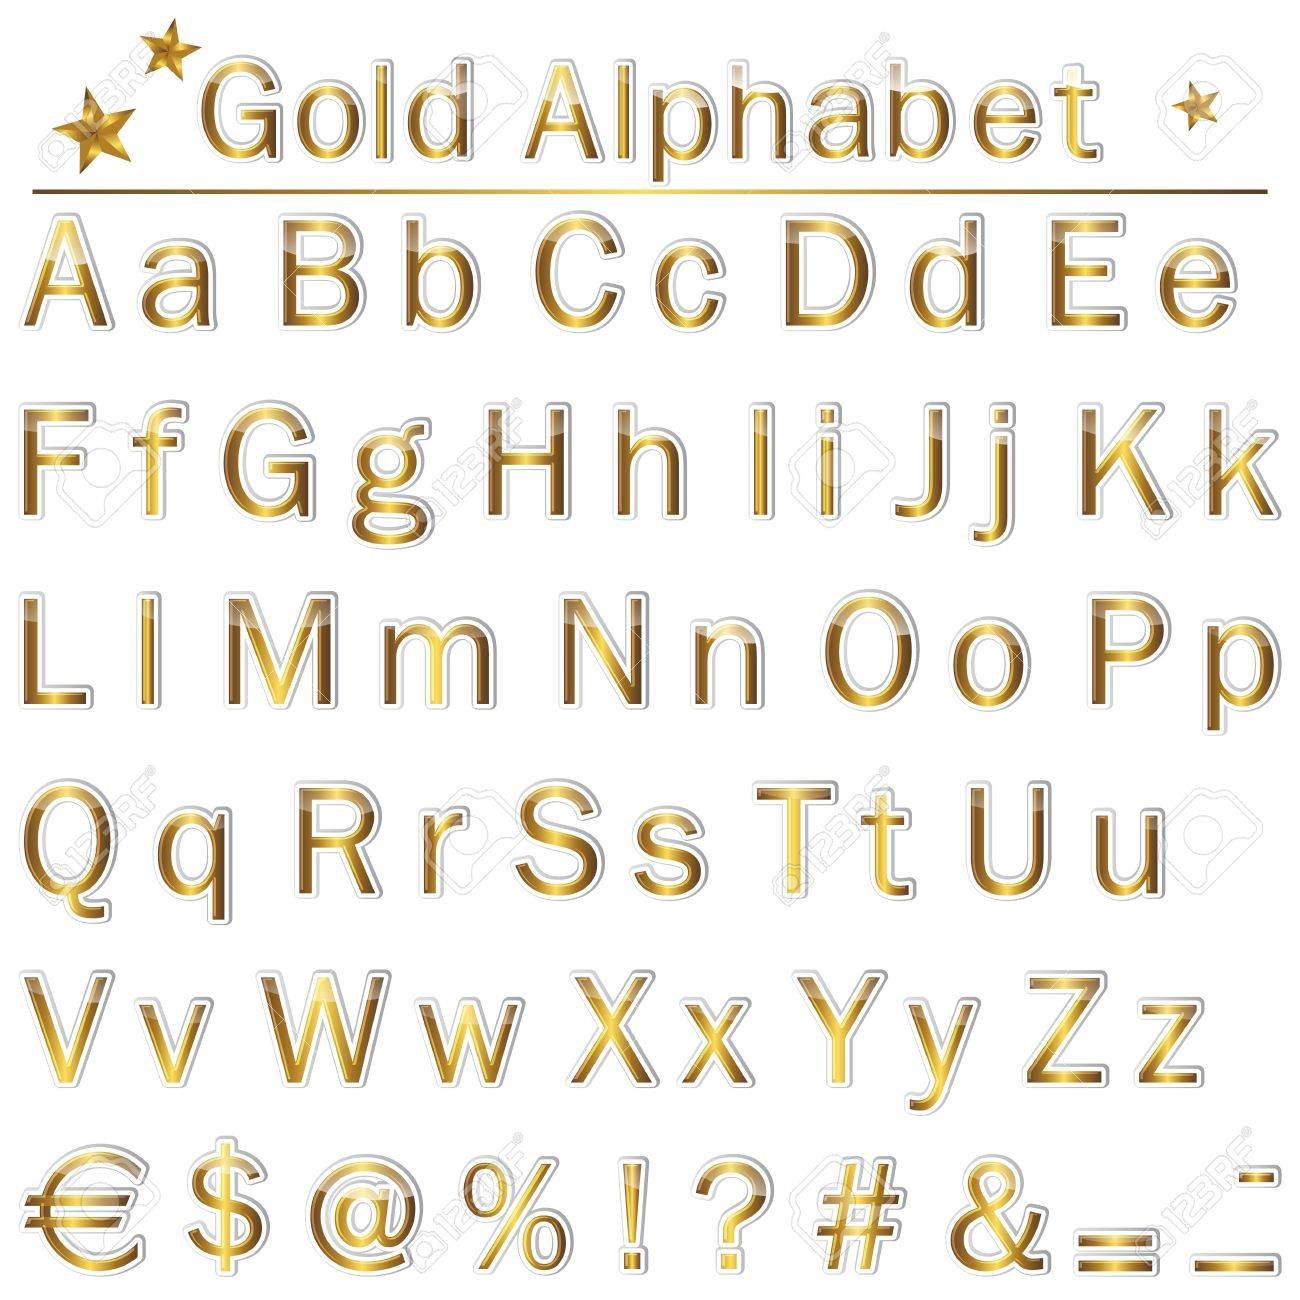 The english golden alphabet punctuation marks and symbols royalty the english golden alphabet punctuation marks and symbols stock vector 14322729 buycottarizona Choice Image